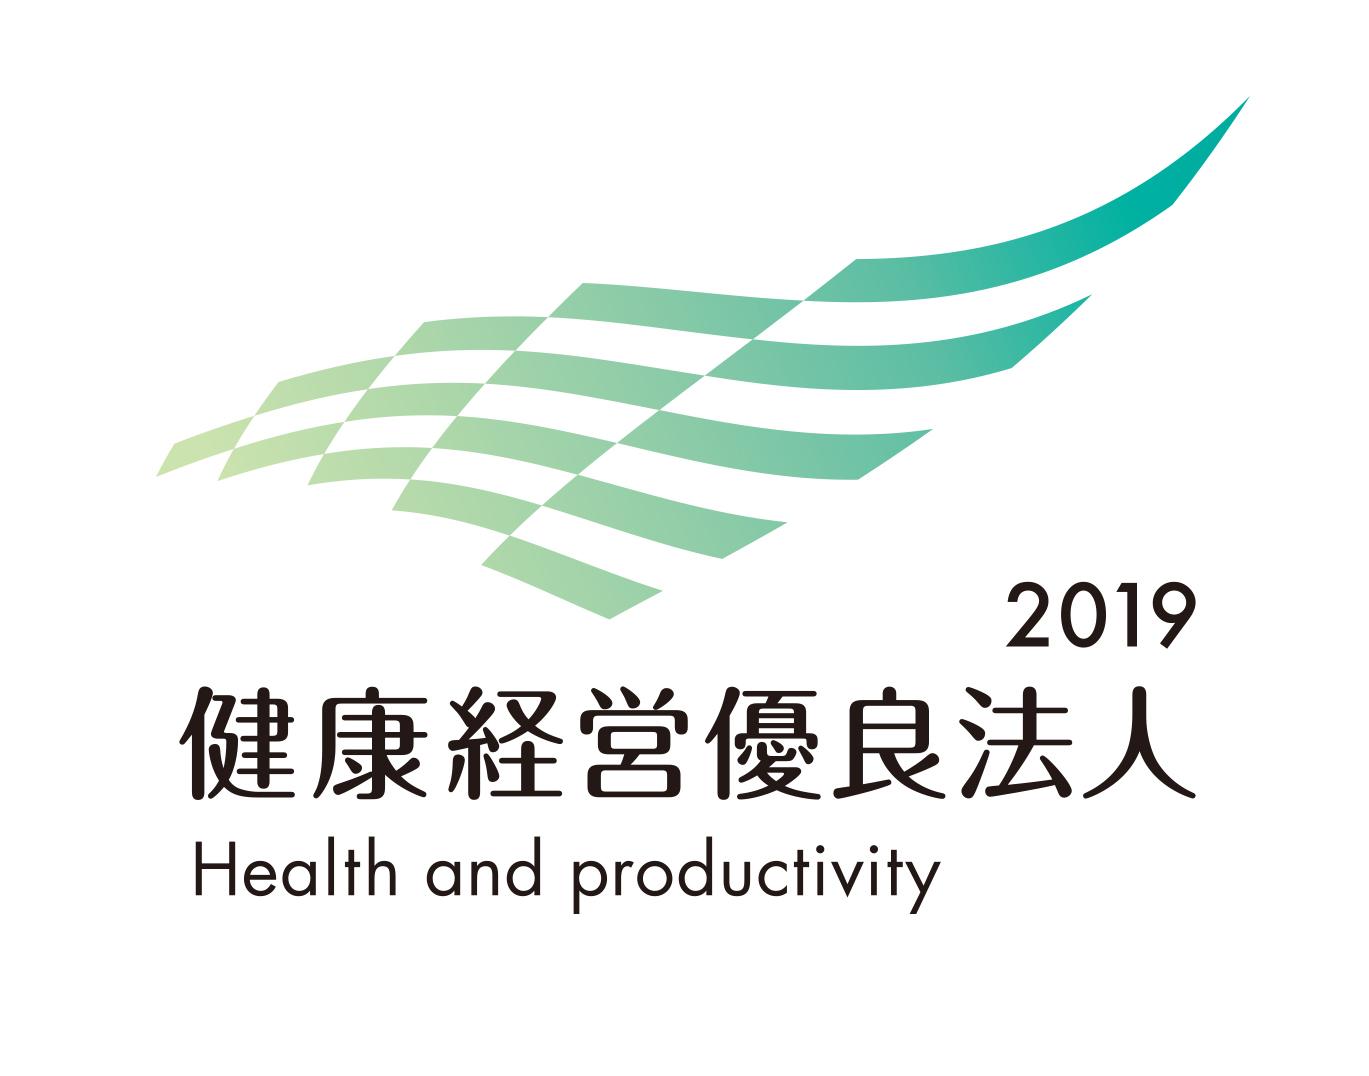 「健康経営優良法人2019(中小企業法人部門)」の認定を取得